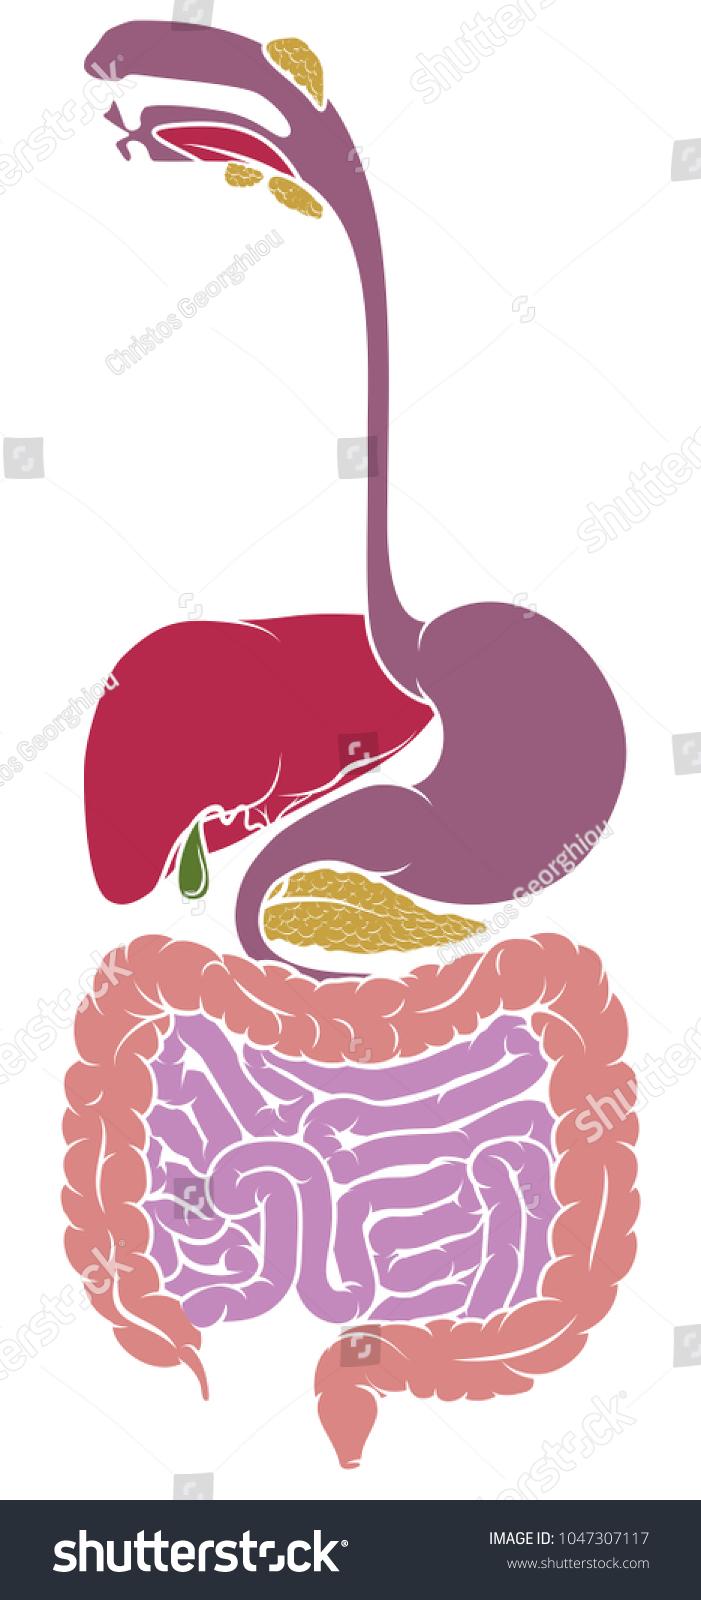 Human Anatomy Diagram Gut Gastrointestinal Tract Stock Illustration